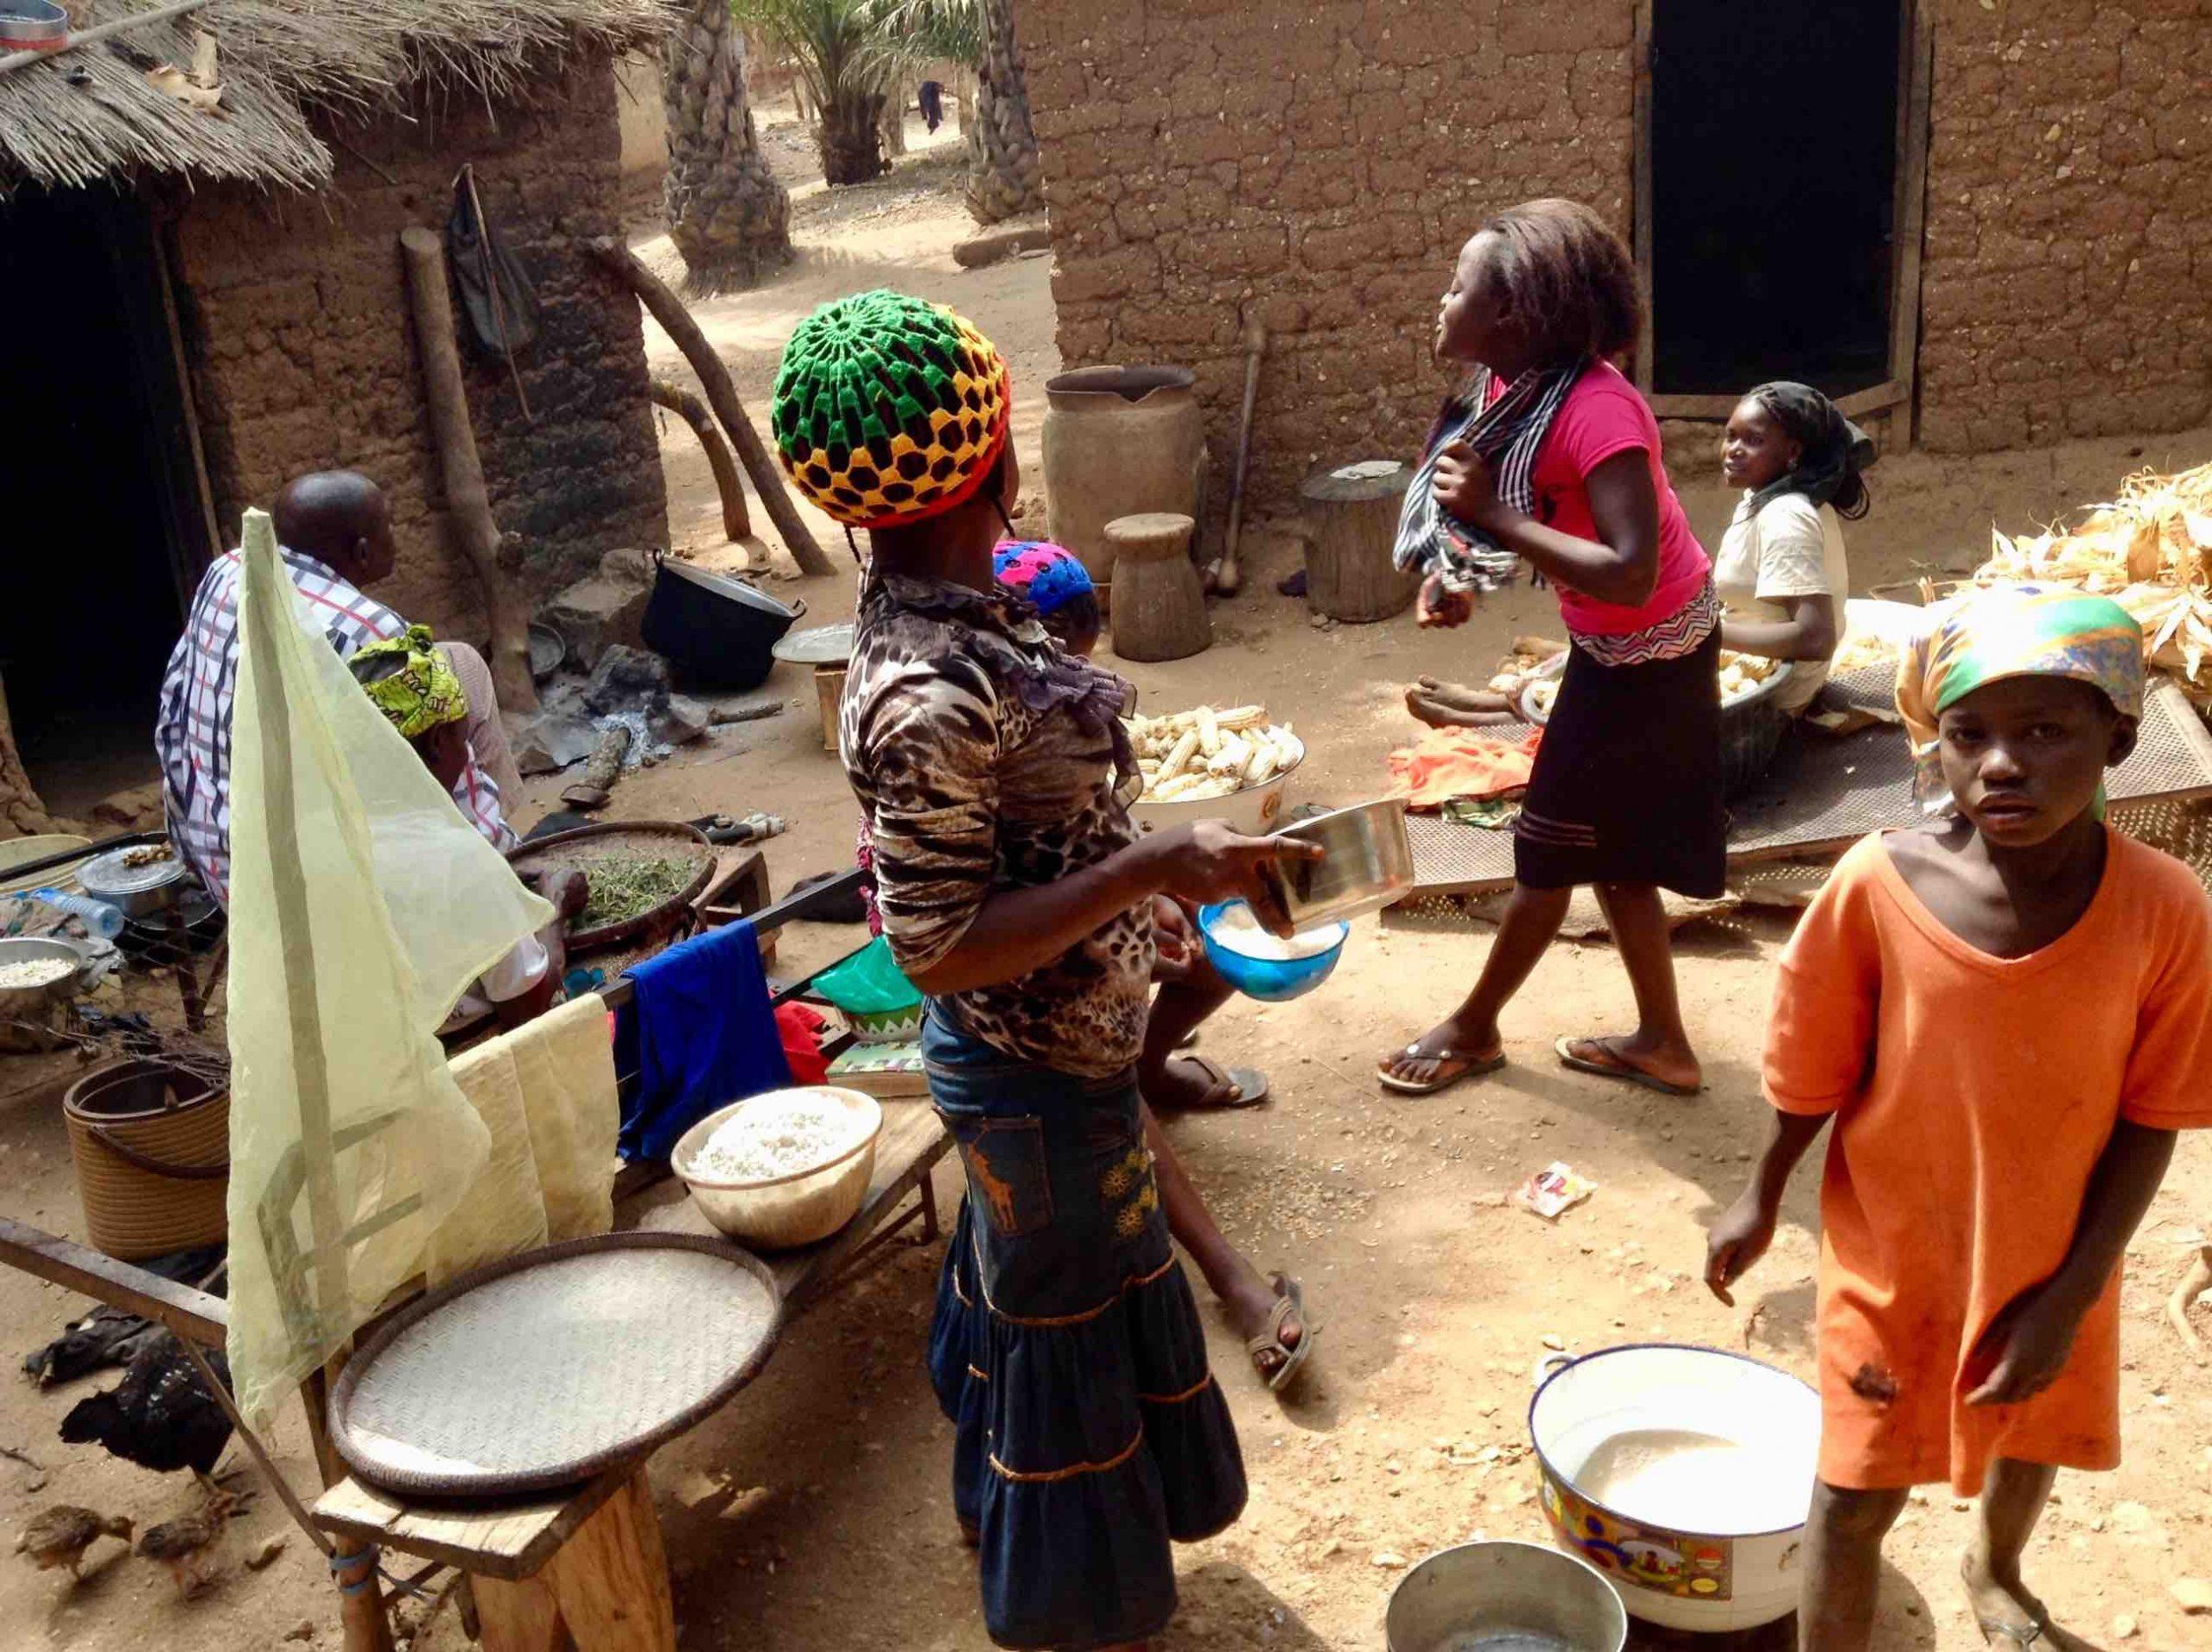 Extreme poverty may hit Nigerians soon – World Bank warns